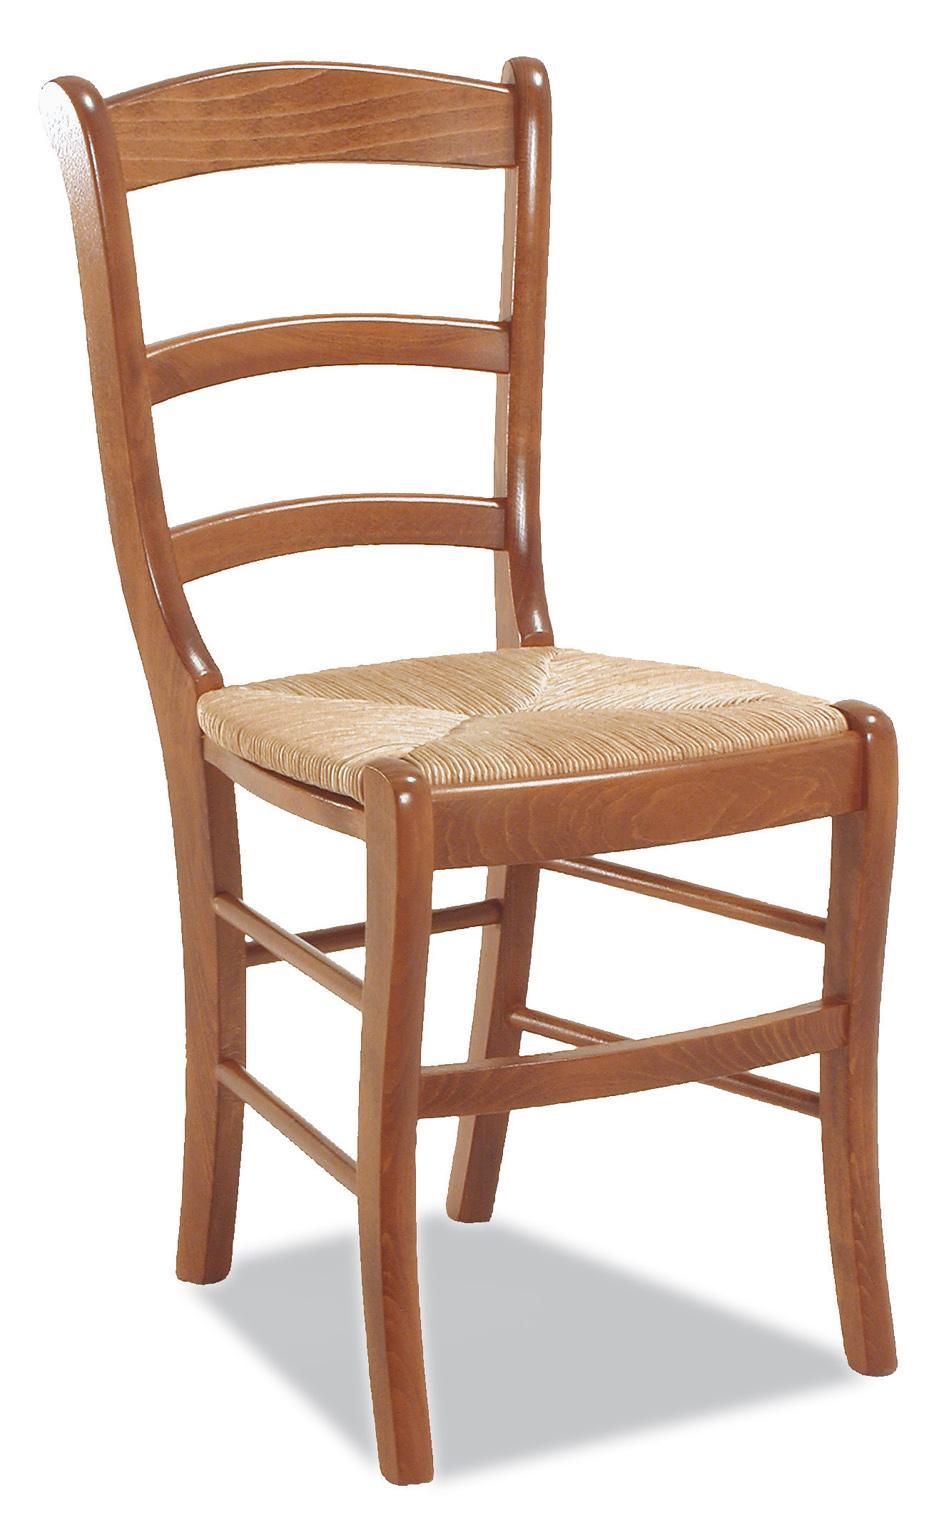 Sillas de comedor dise o 4 0 10000 0 piezas for Ver sillas para comedor